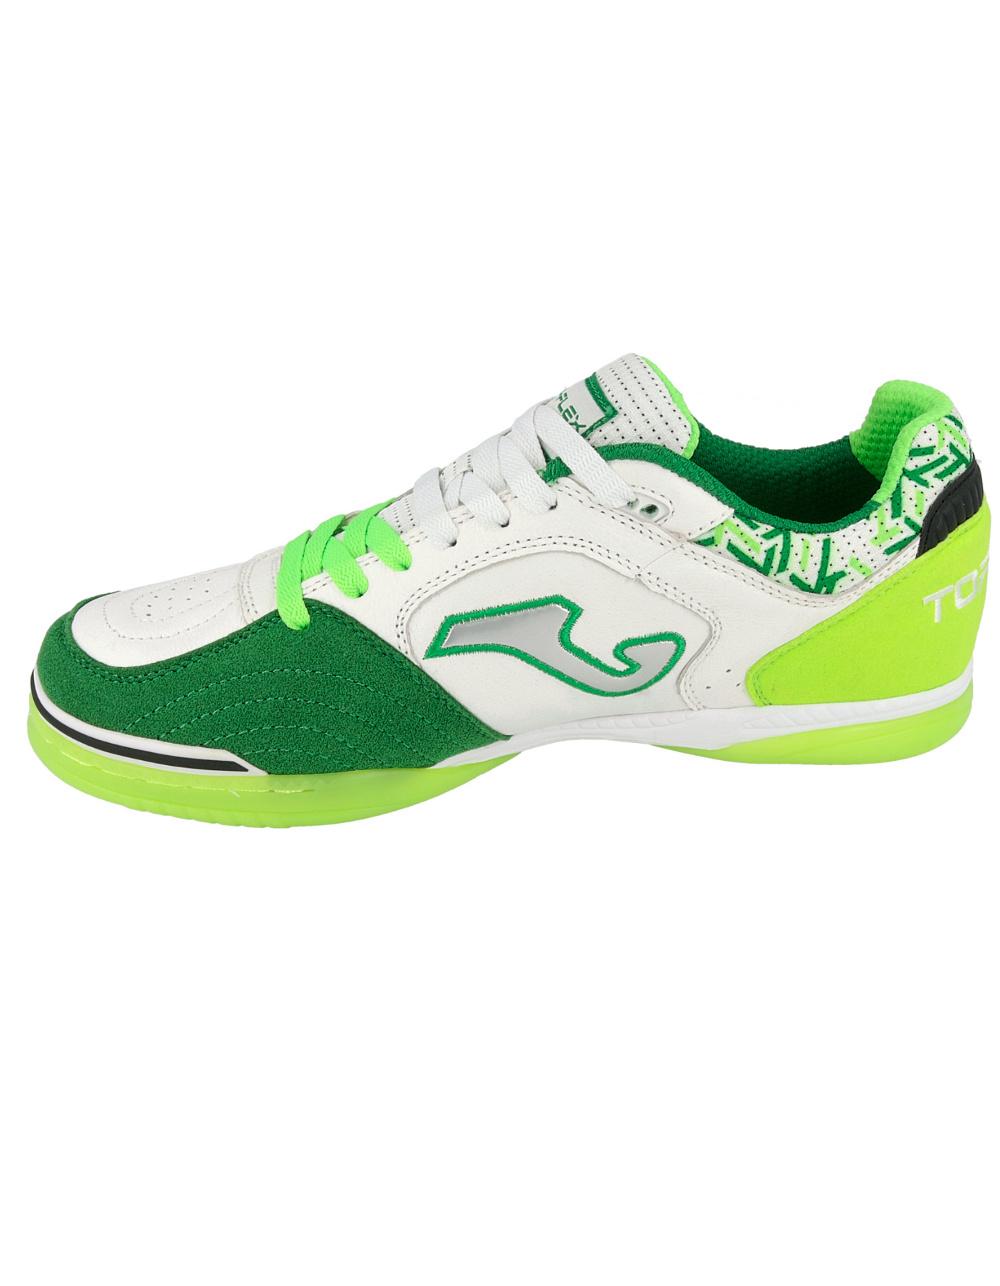 9d85c657b4dcc Football shoes Joma Scarpe da calcetto Calcio Top Flex Bianco verde Indoor  815 6 6 di 8 ...